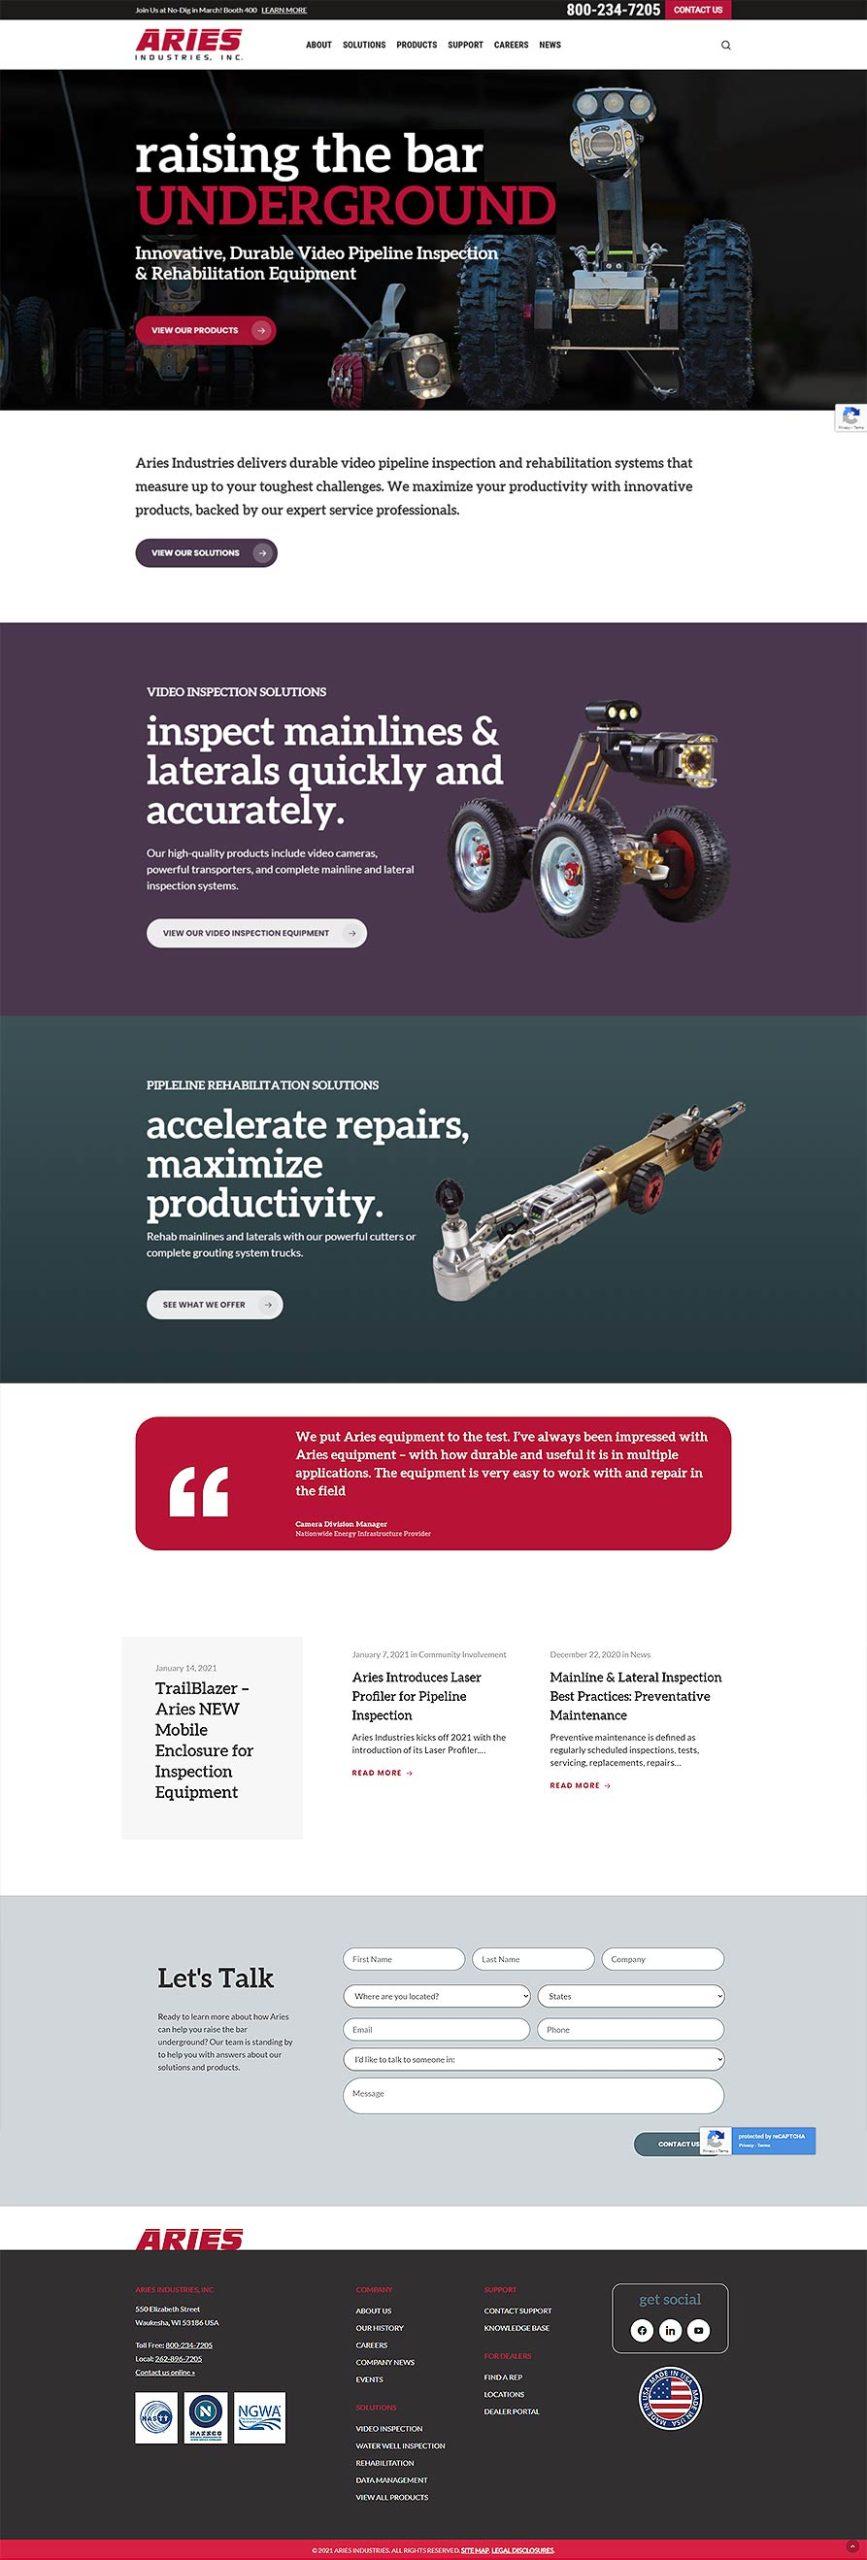 aries industries webite design